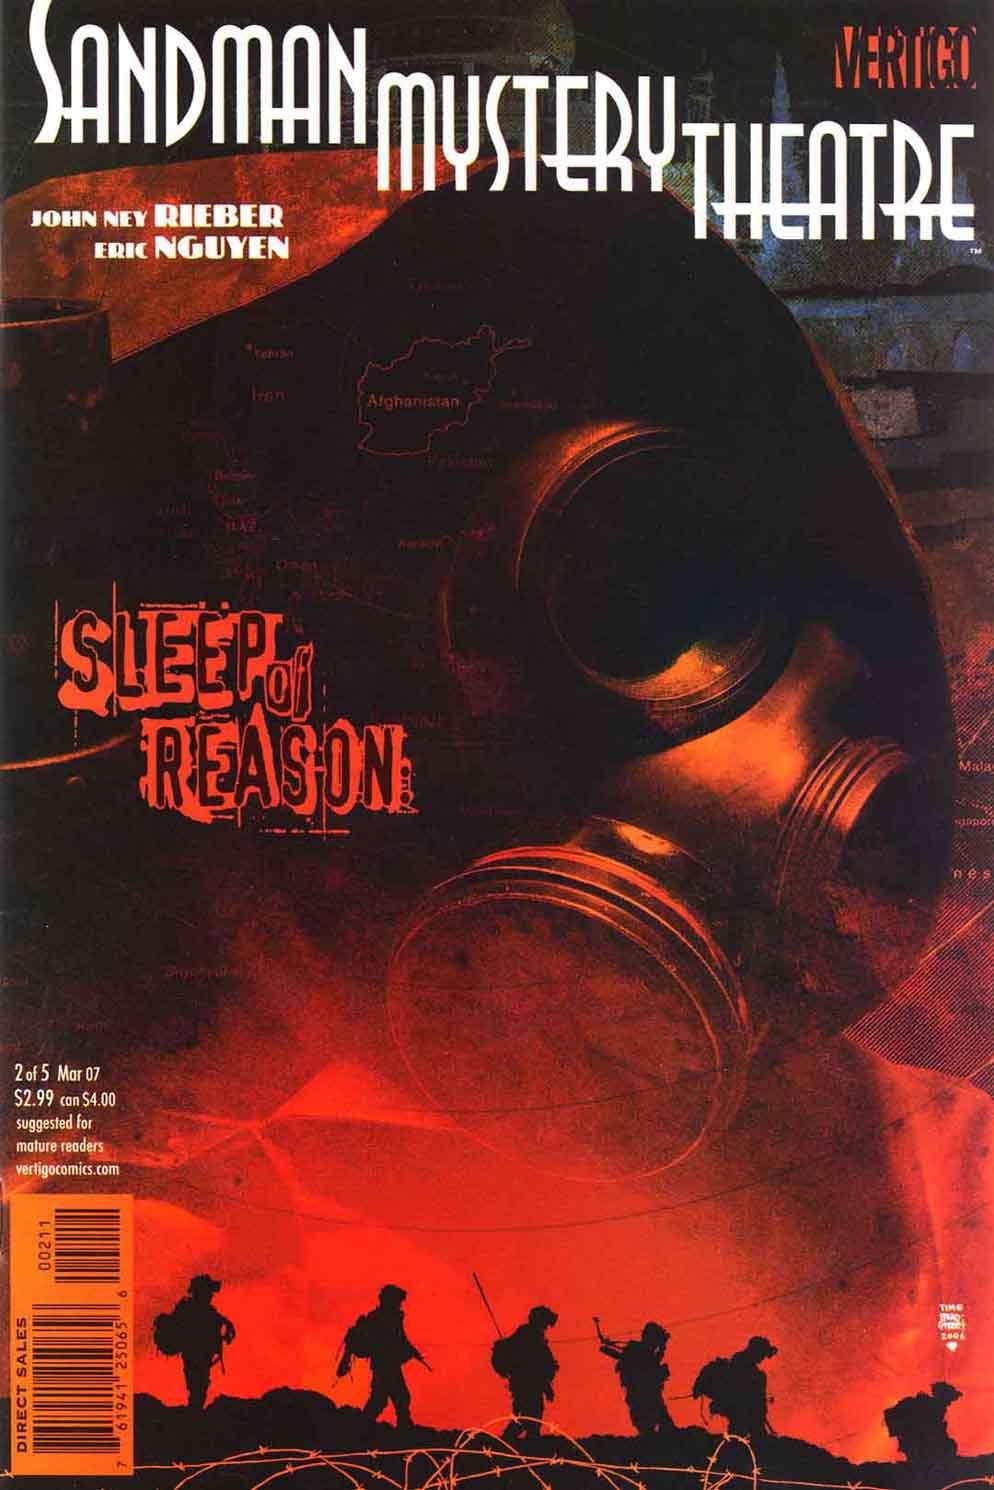 Sandman Mystery Theatre: Sleep of Reason Vol 1 2